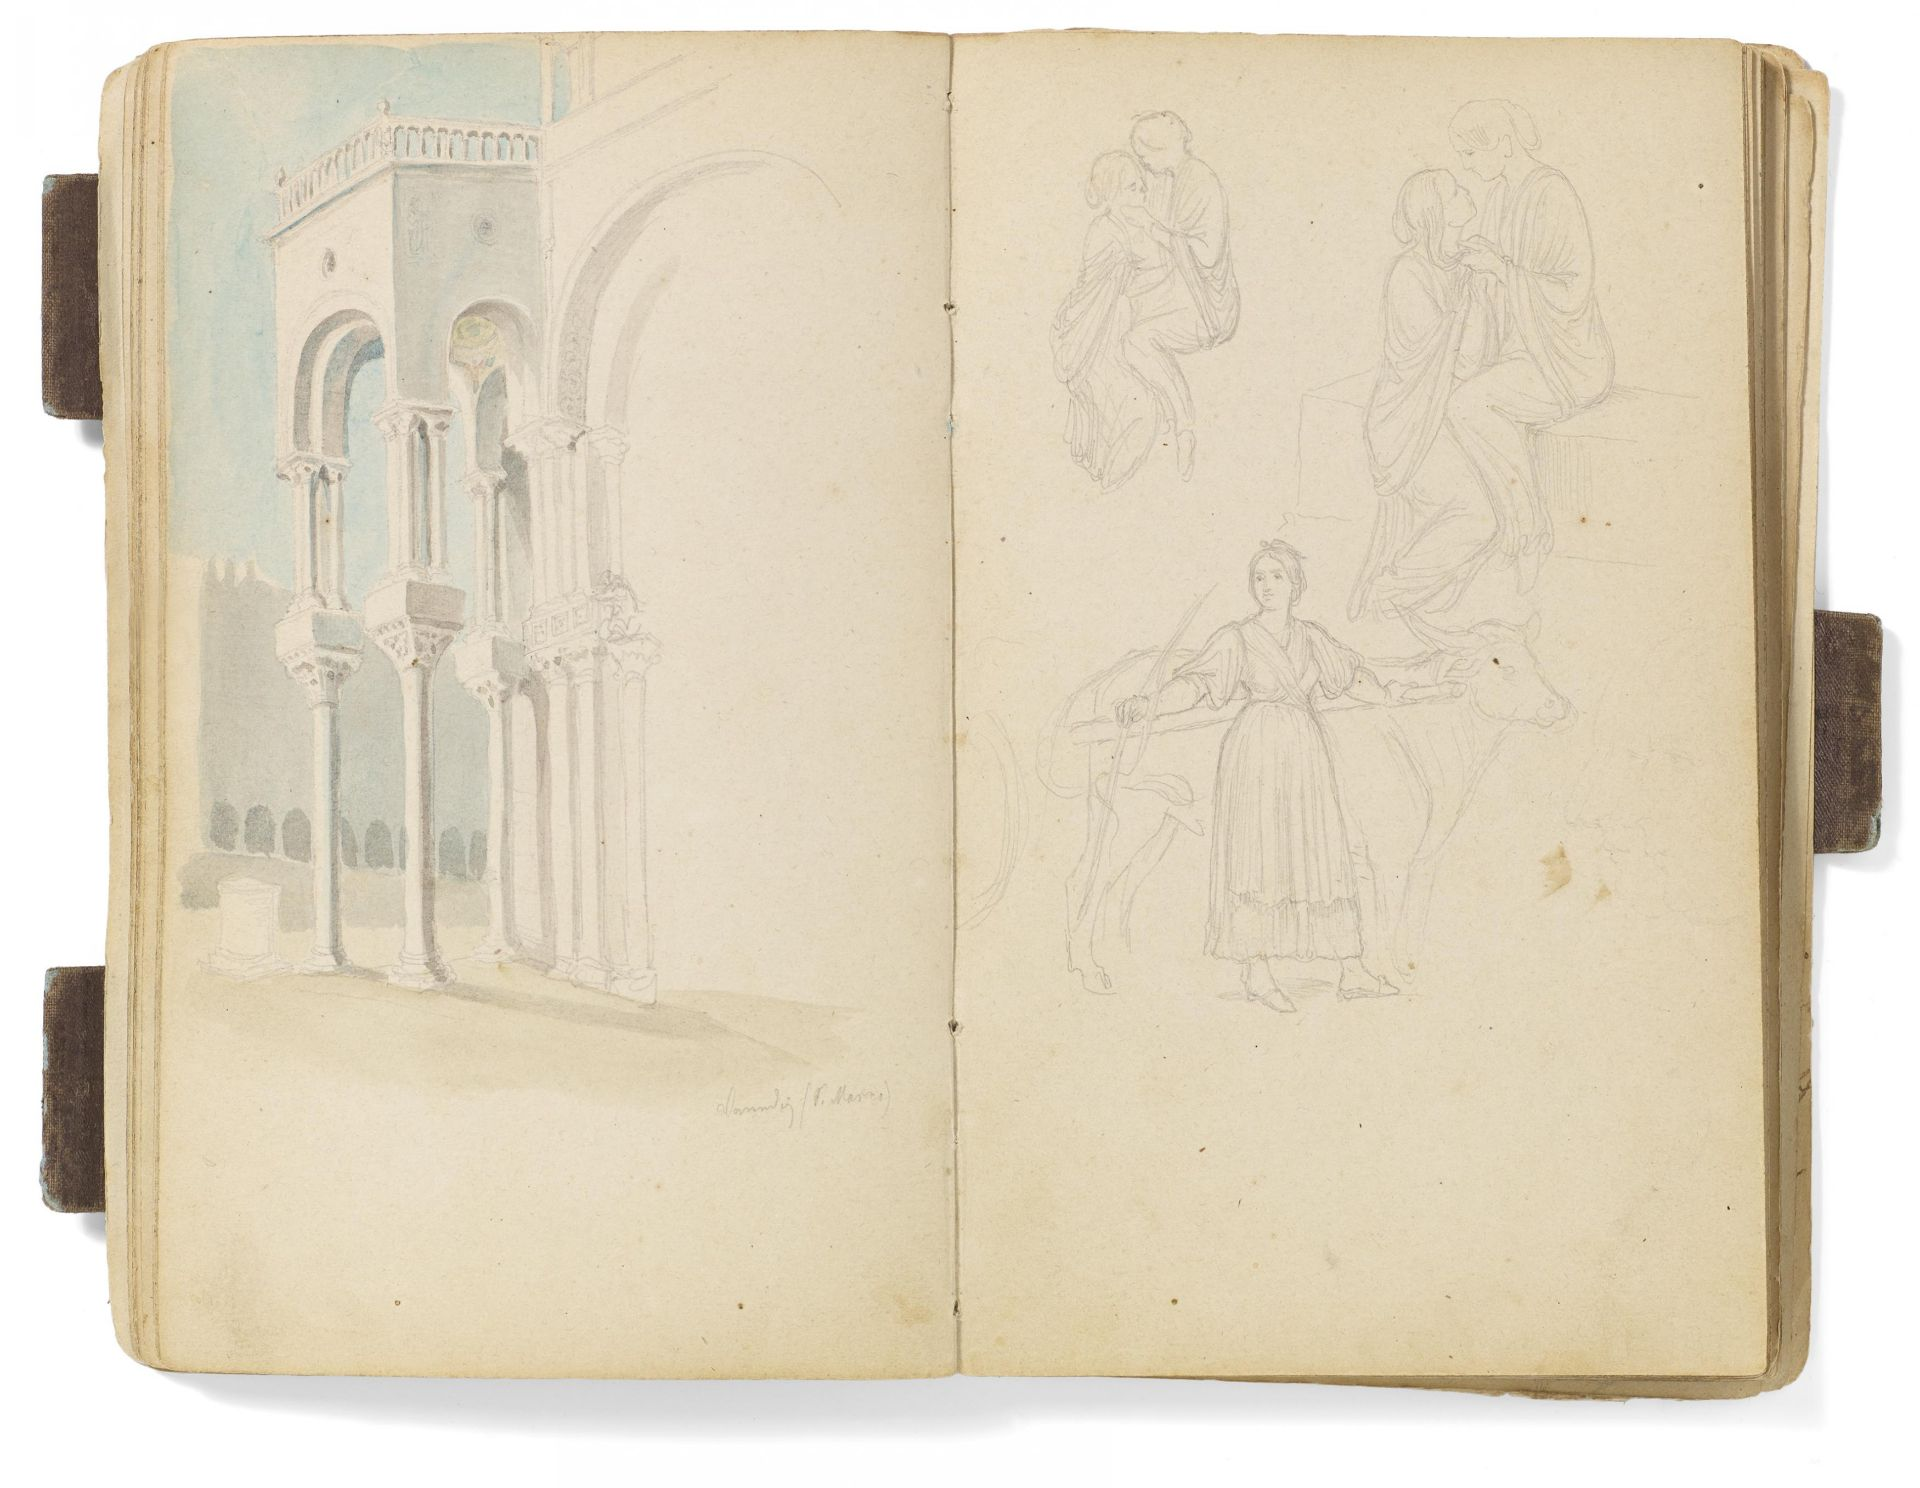 Kaupert, Gustav Kassel 1819 - 1897  Sketchbook, ca. 50 pages. Architecture, Italian landscapes - Bild 4 aus 6